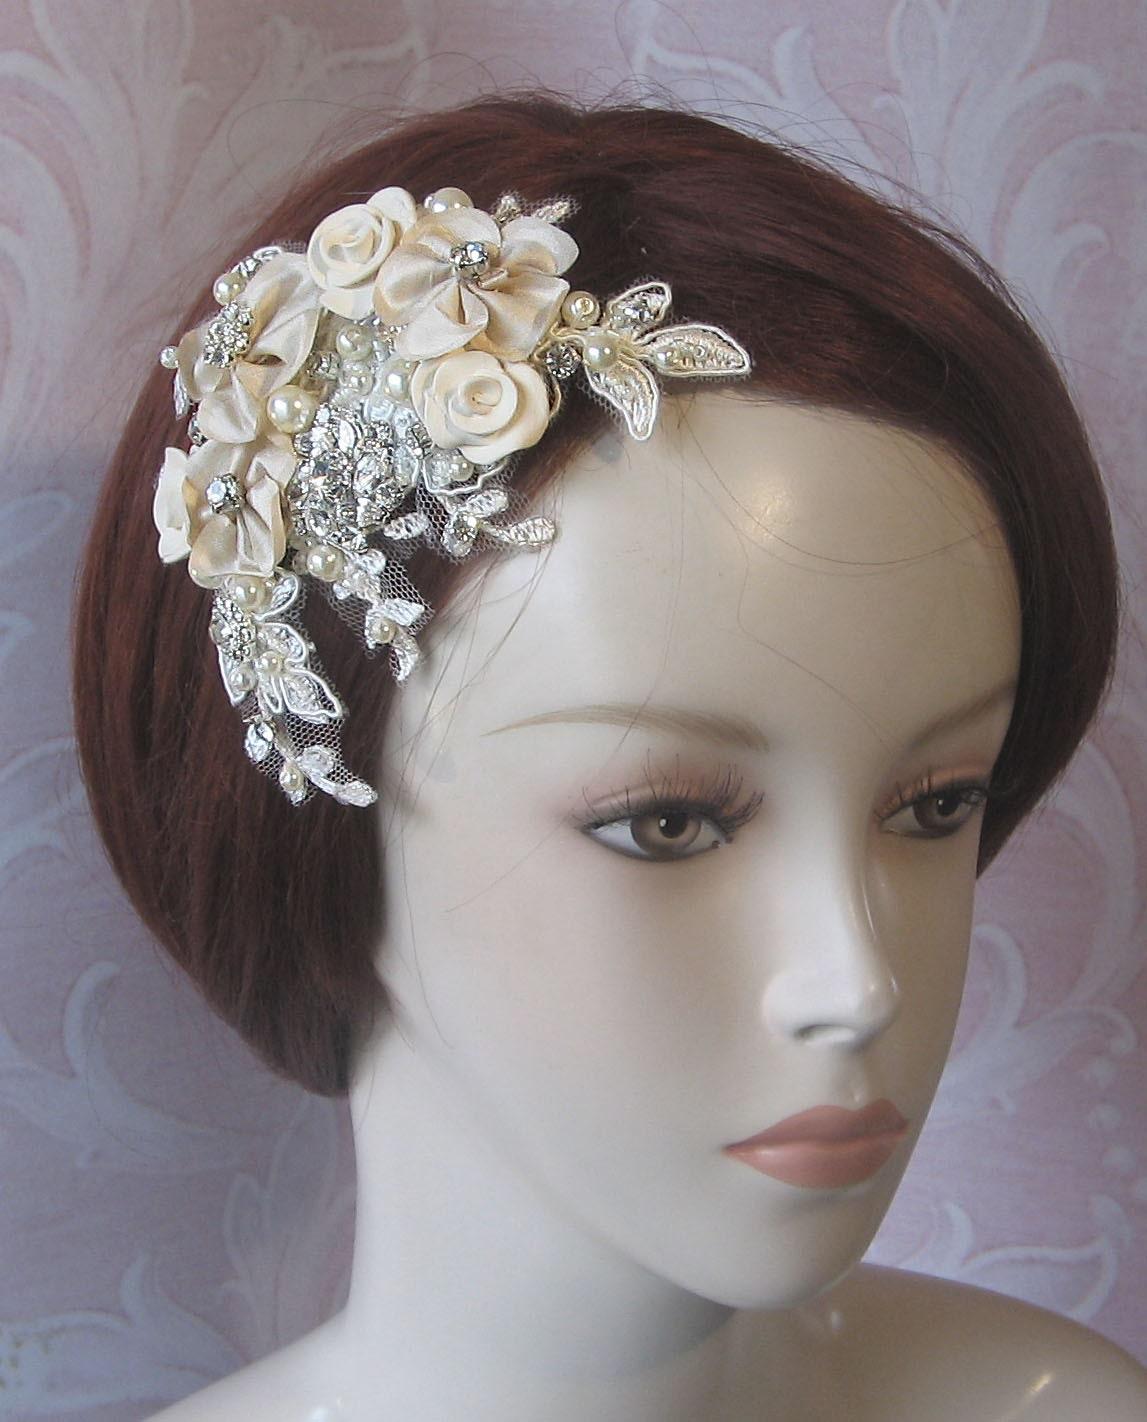 Champagne Fascinator, Bridal Fascinator, Hair Flowers with Rhinestones and Pearls - INGENUE